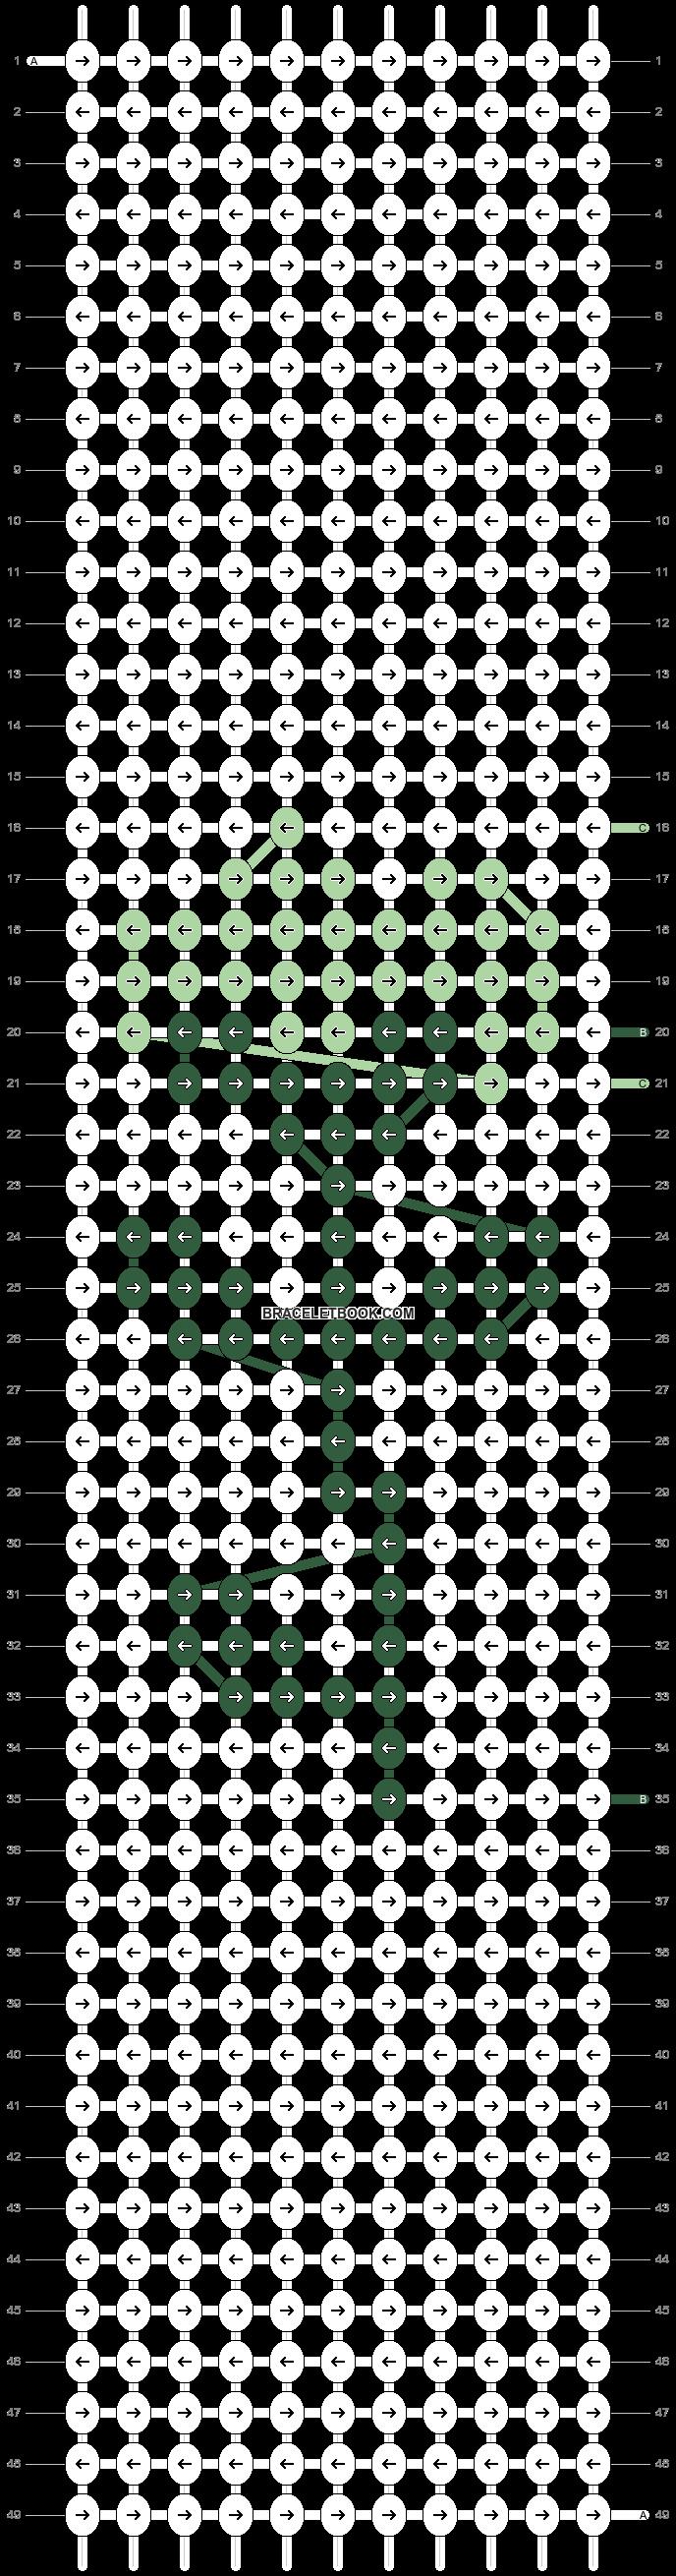 Alpha pattern #85987 pattern